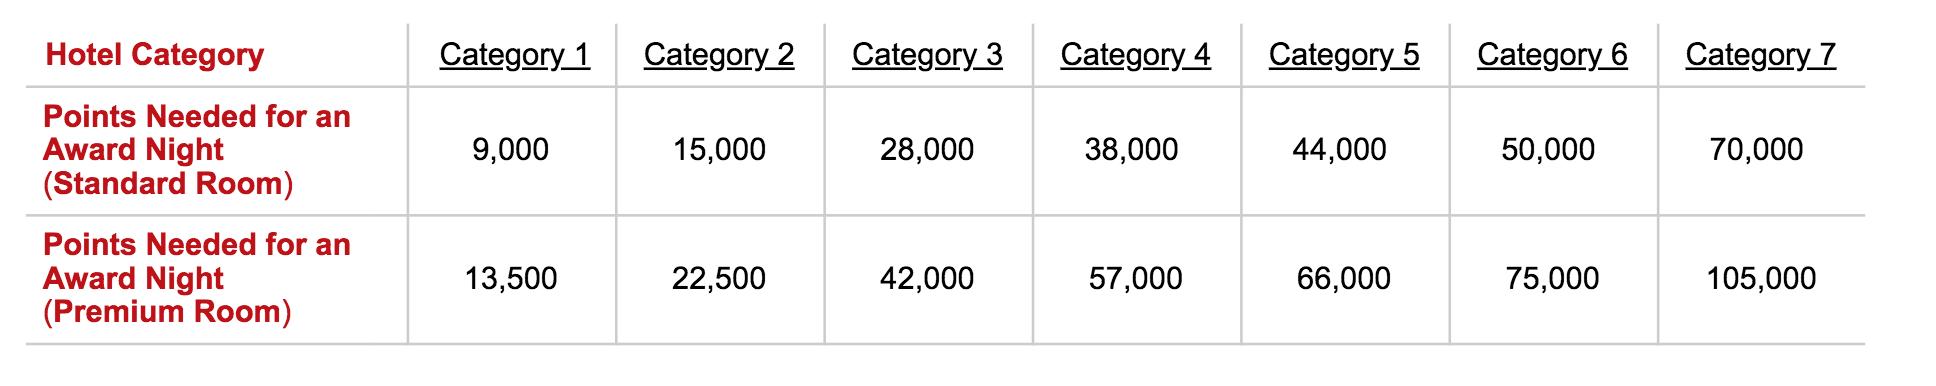 Radisson Rewards: The Complete Guide - NerdWallet